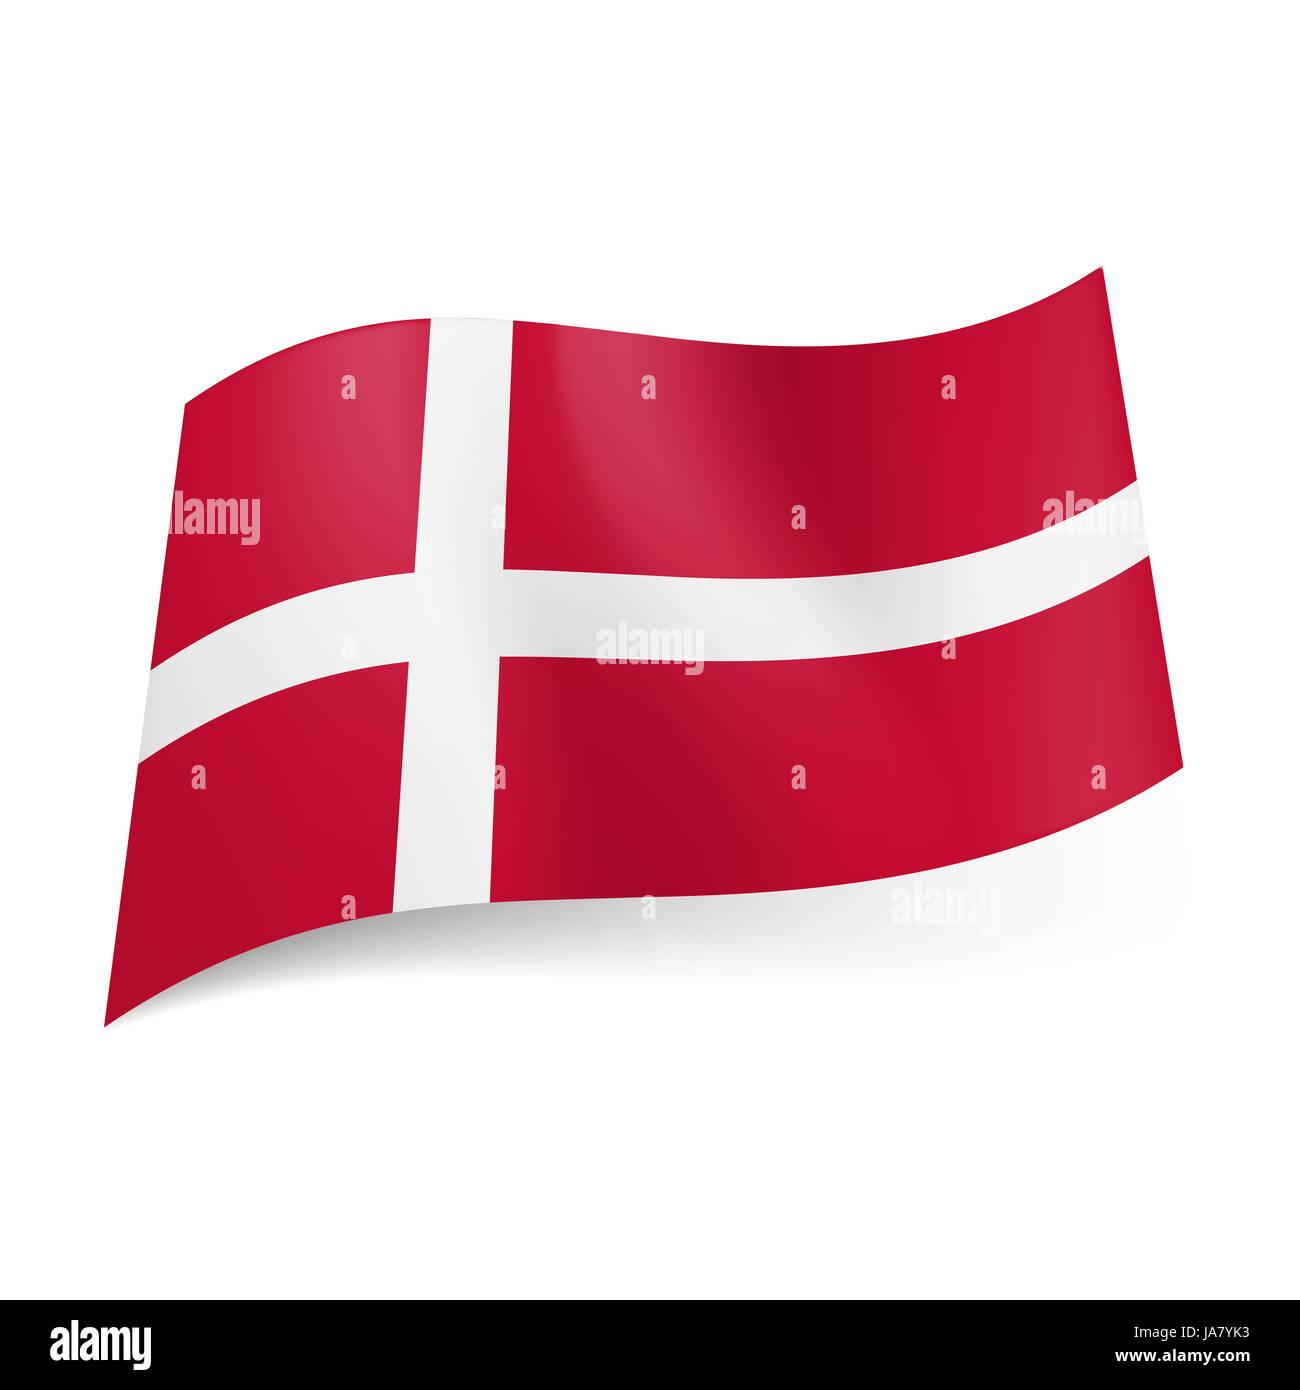 Bandiera Nazionale Della Danimarca Bianca Croce Scandinavo Su